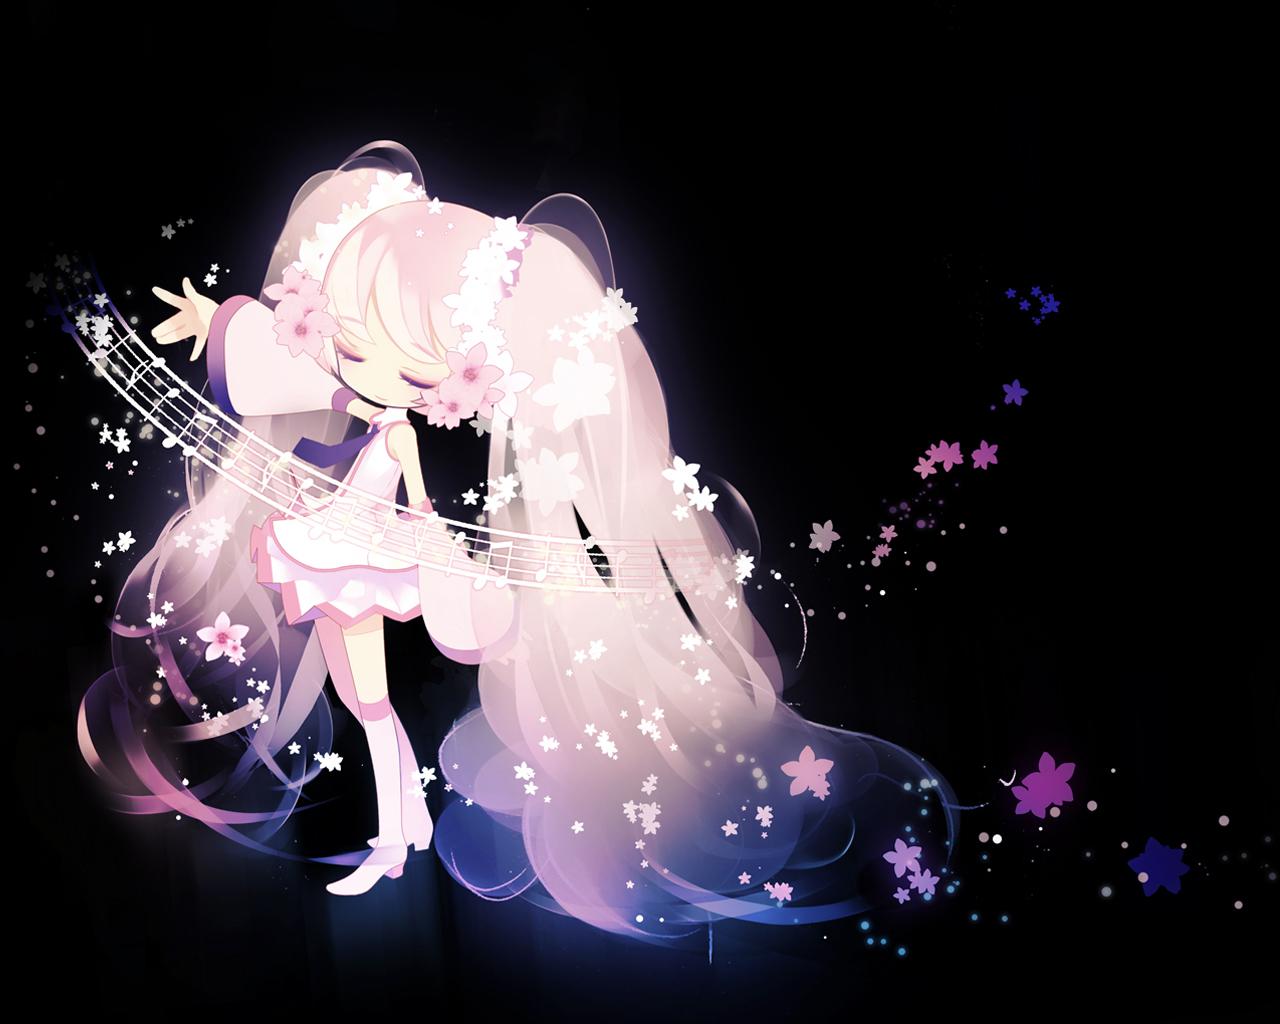 Hatsune Miku Download Image